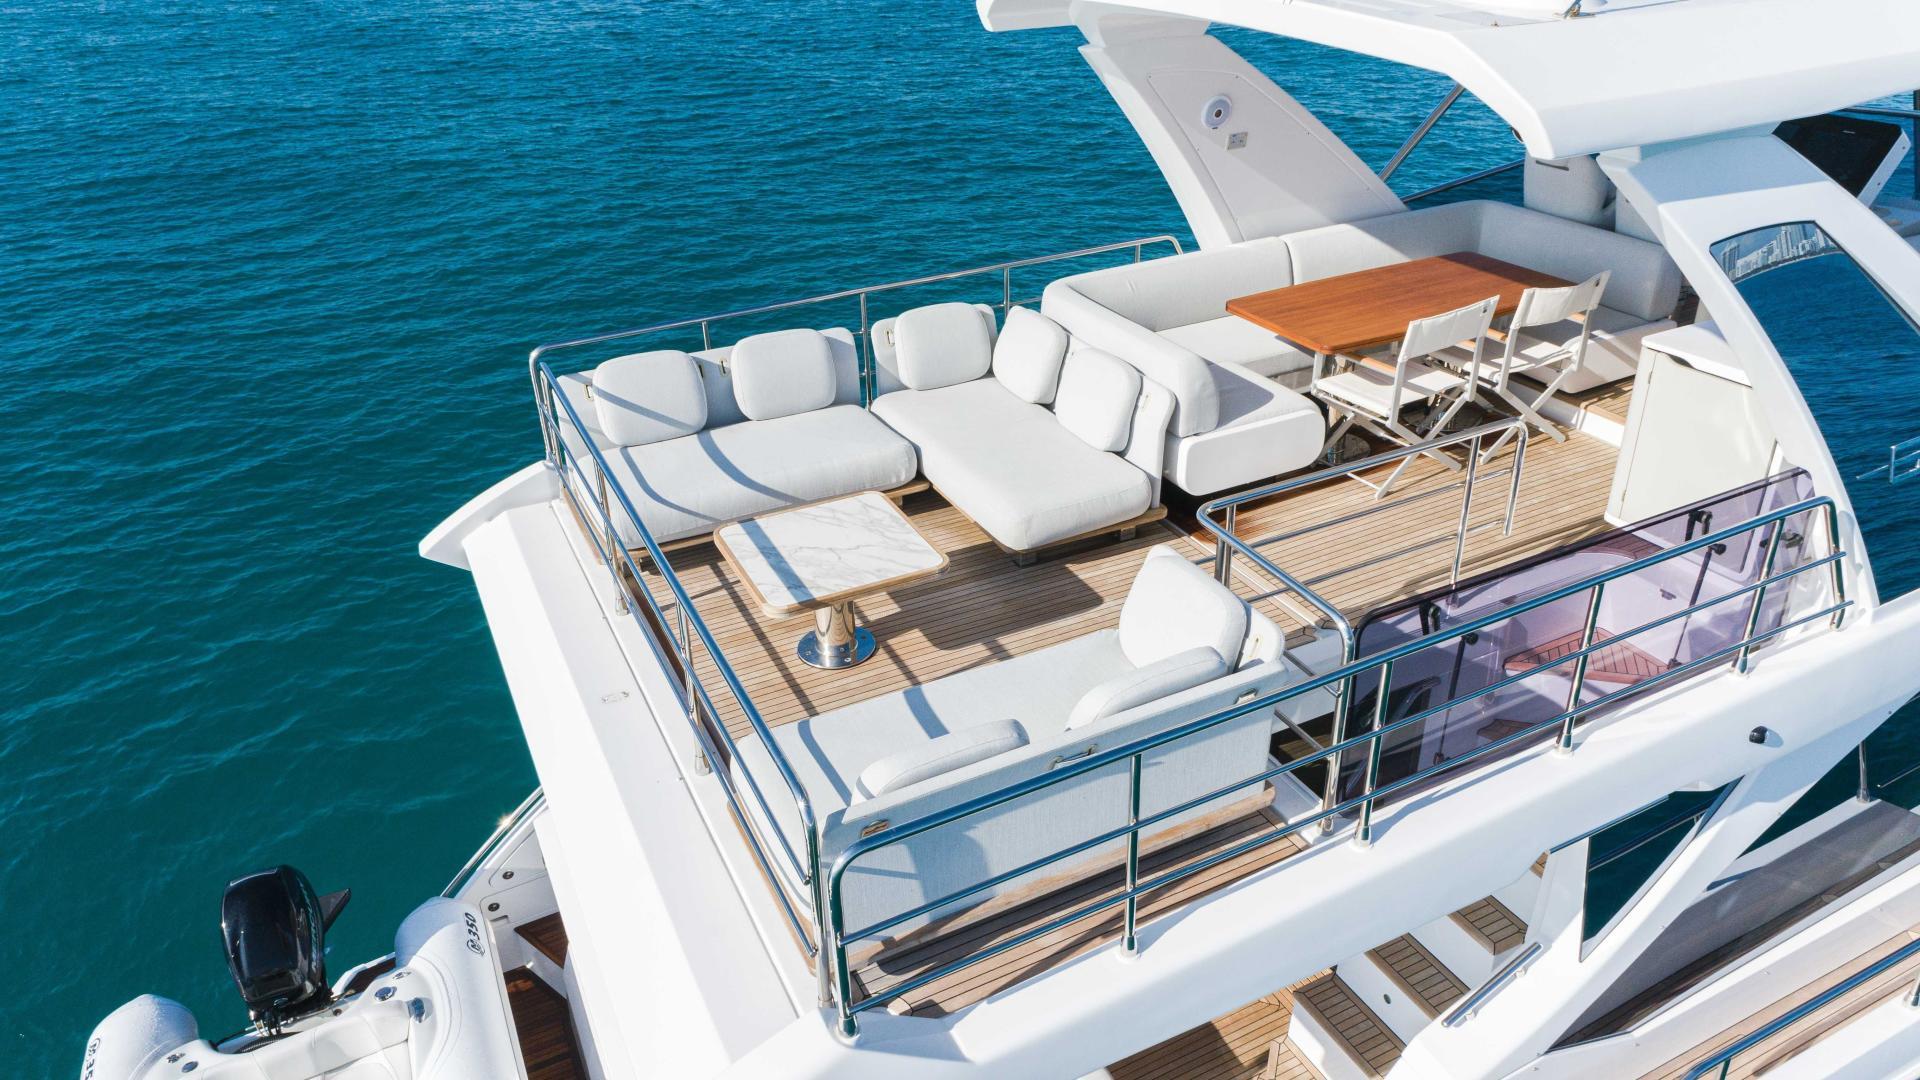 Azimut-60 Fly 2019-Still Dreaming Fisher Island-Florida-United States-1322672 | Thumbnail